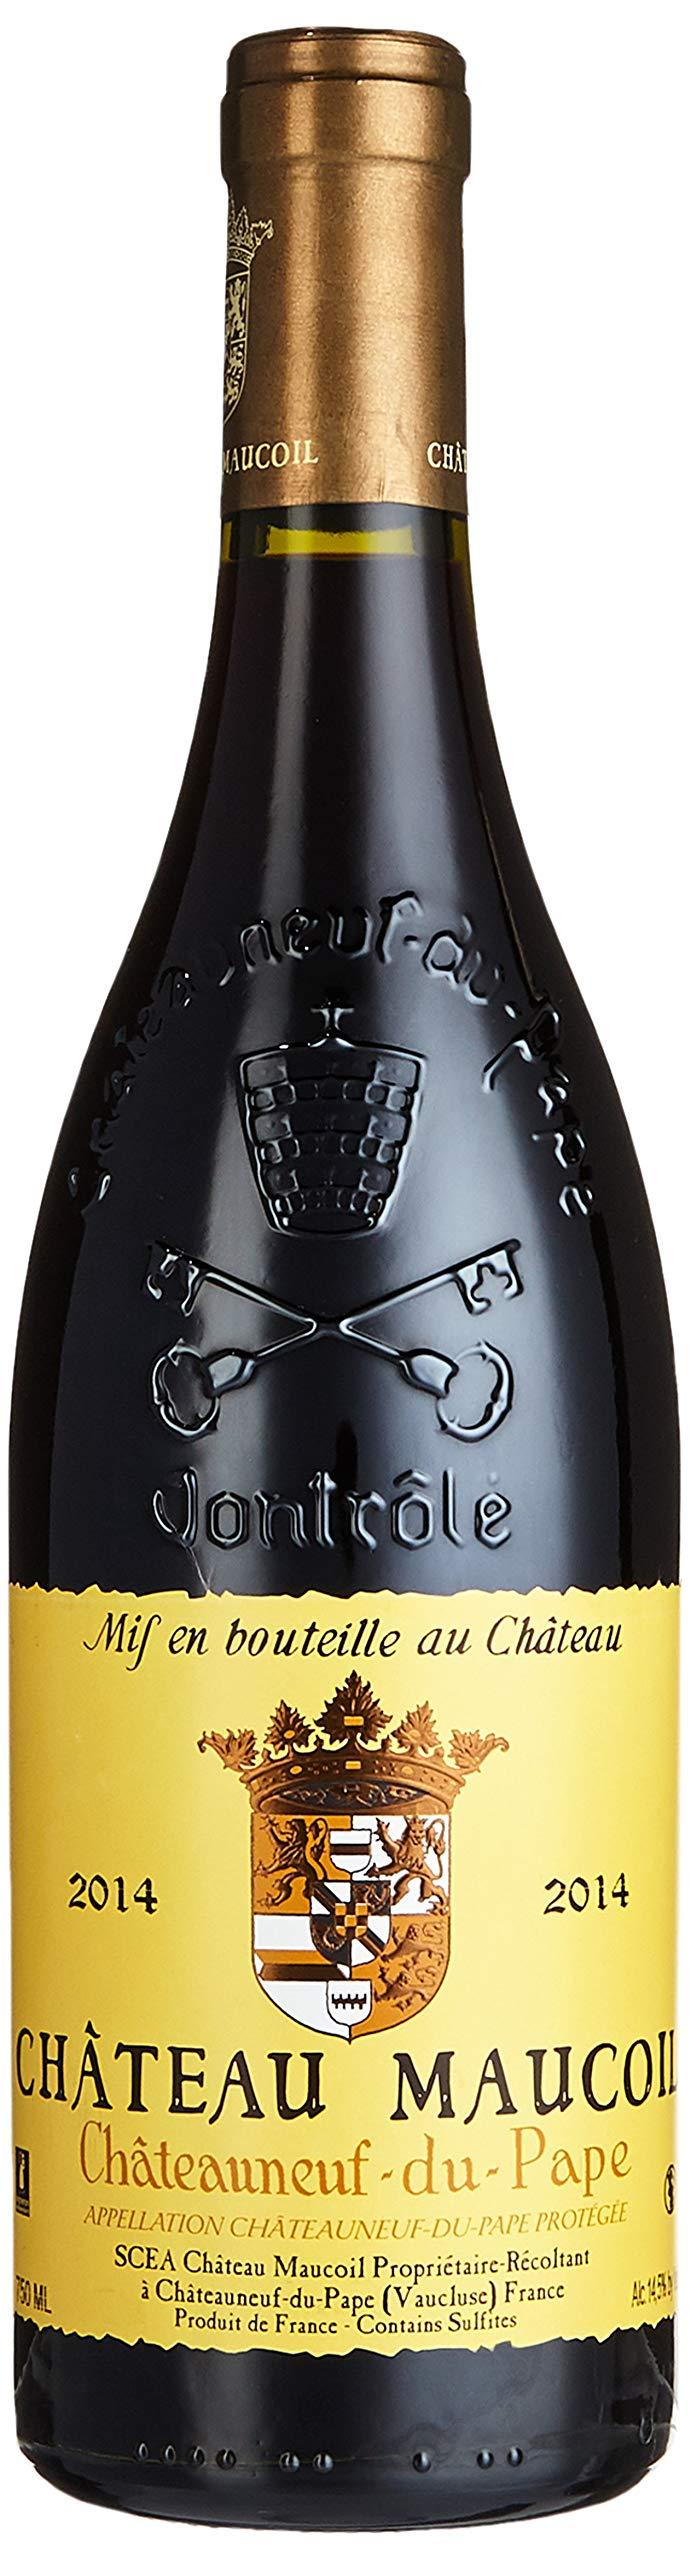 Chteau-Maucoil-Chteauneuf-du-Pape-Tradition-de-Maucoil-Cuve-2014-Trocken-1-x-075-l-Auszeichnungen-Wine-Spectator-92-Punkte-Jg-2014